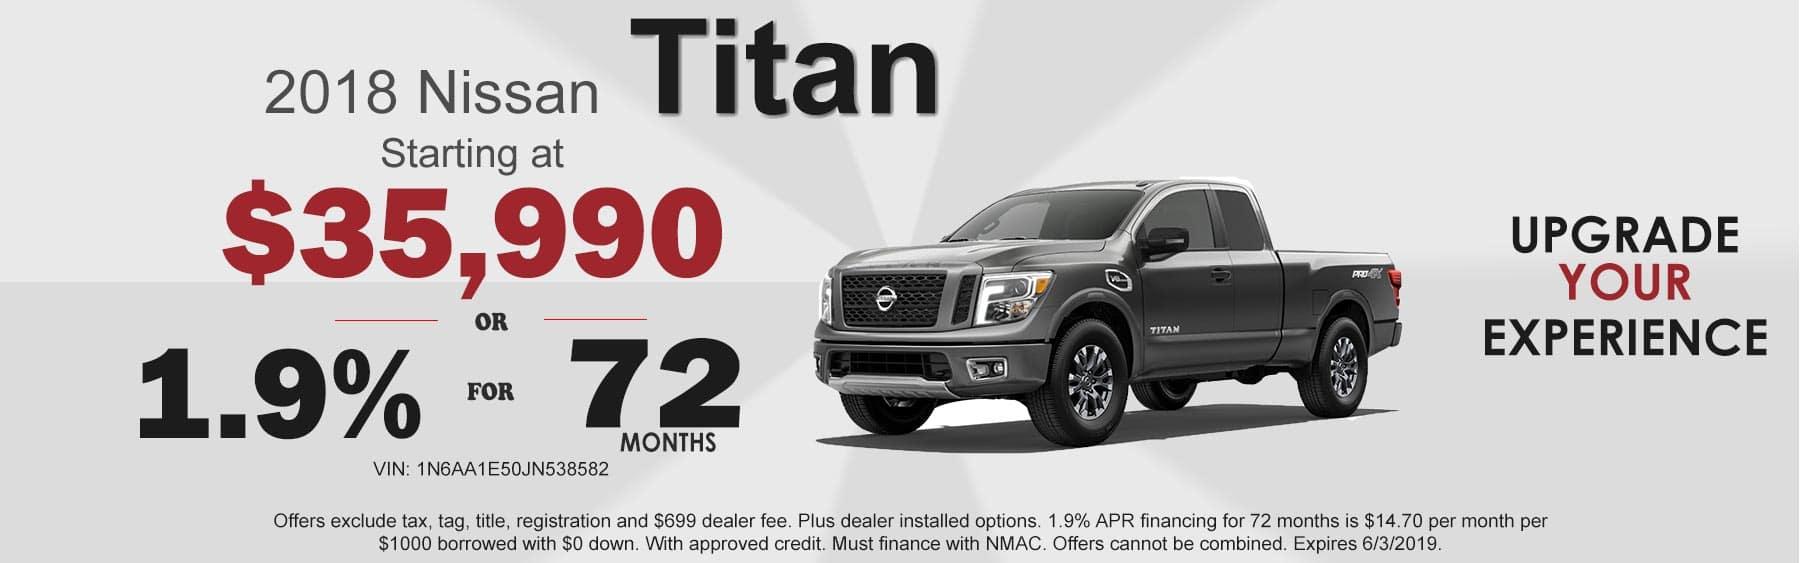 Nissan Titan offers, Titan truck for sale Boone, NC